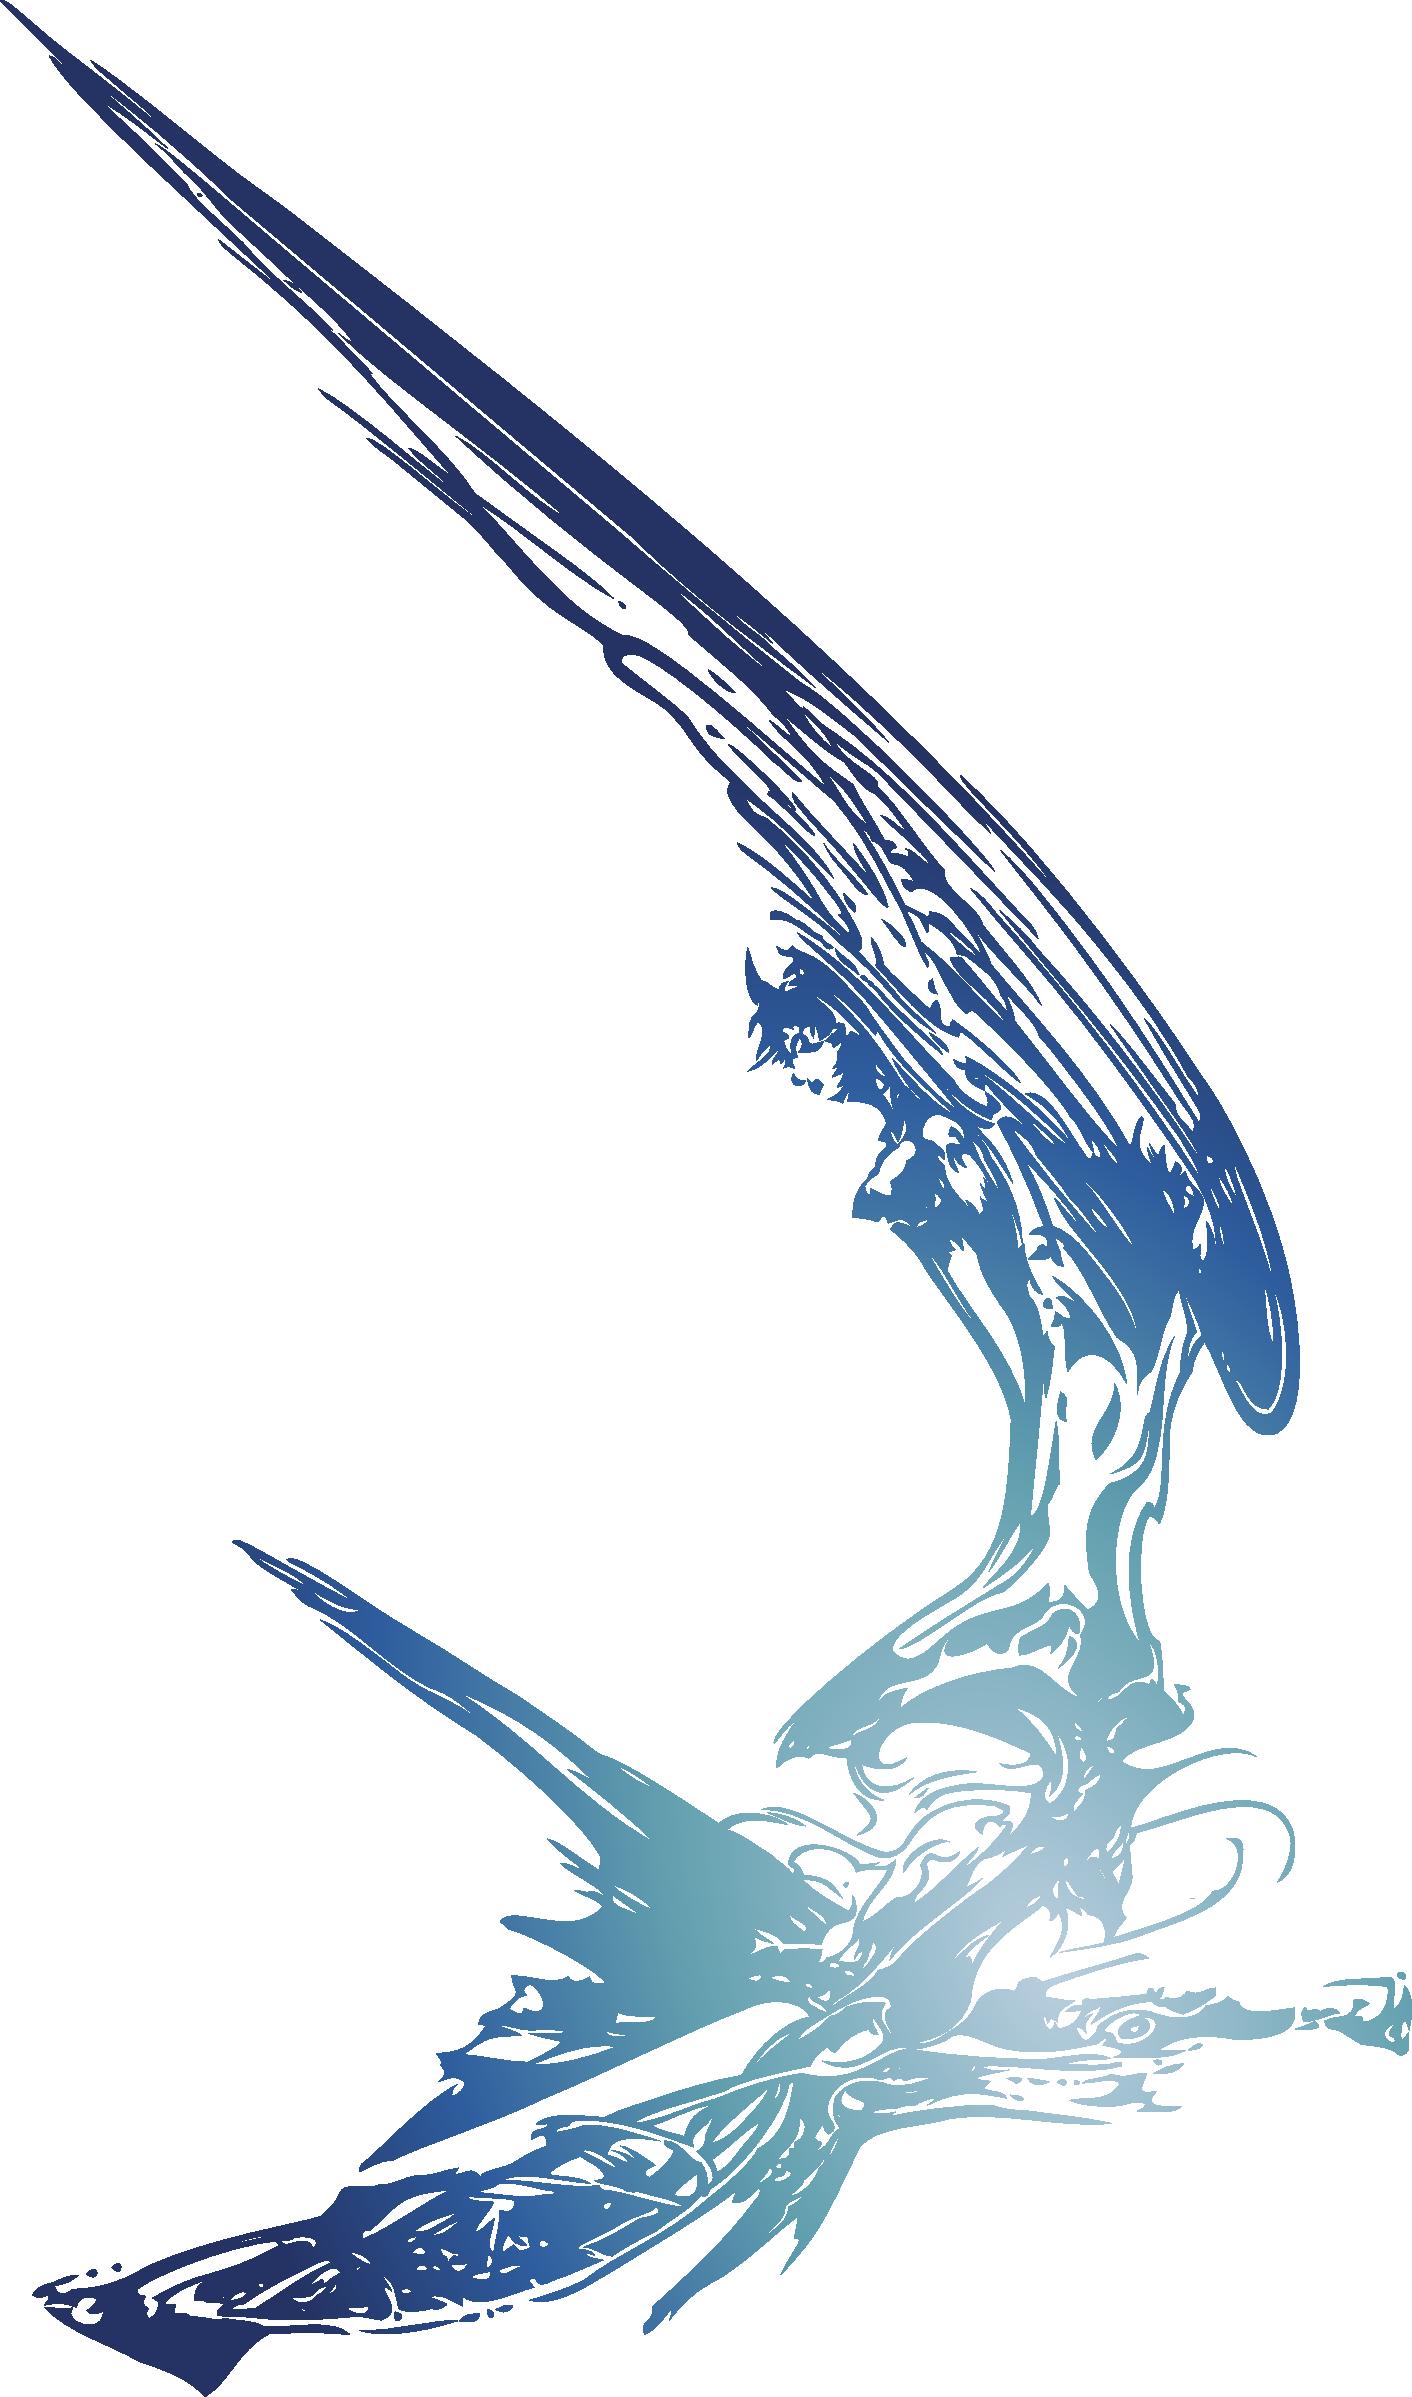 Final fantasy logo art - photo#13